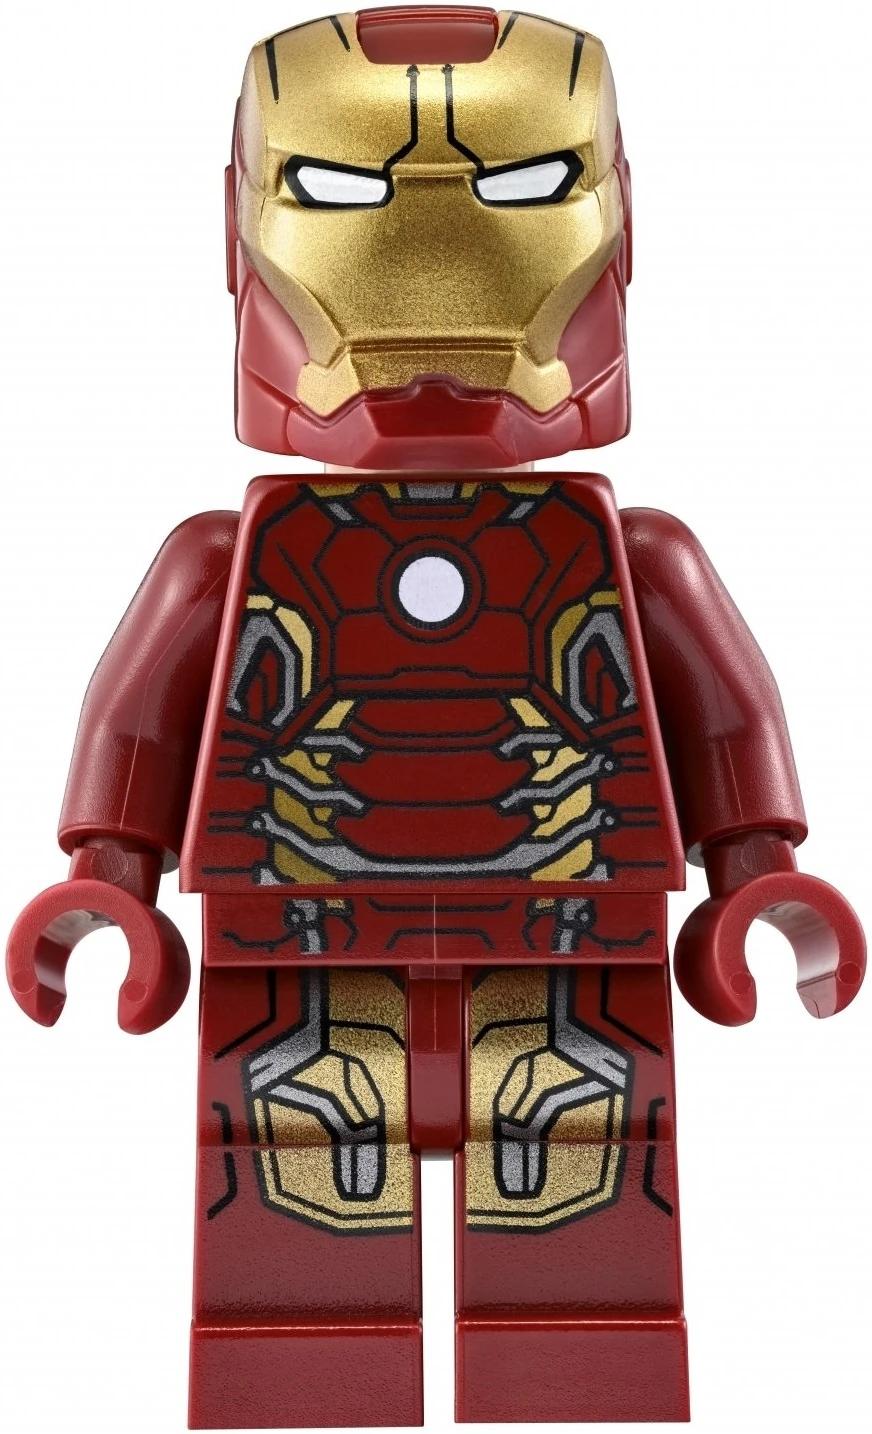 lego iron man mark 34 - photo #20